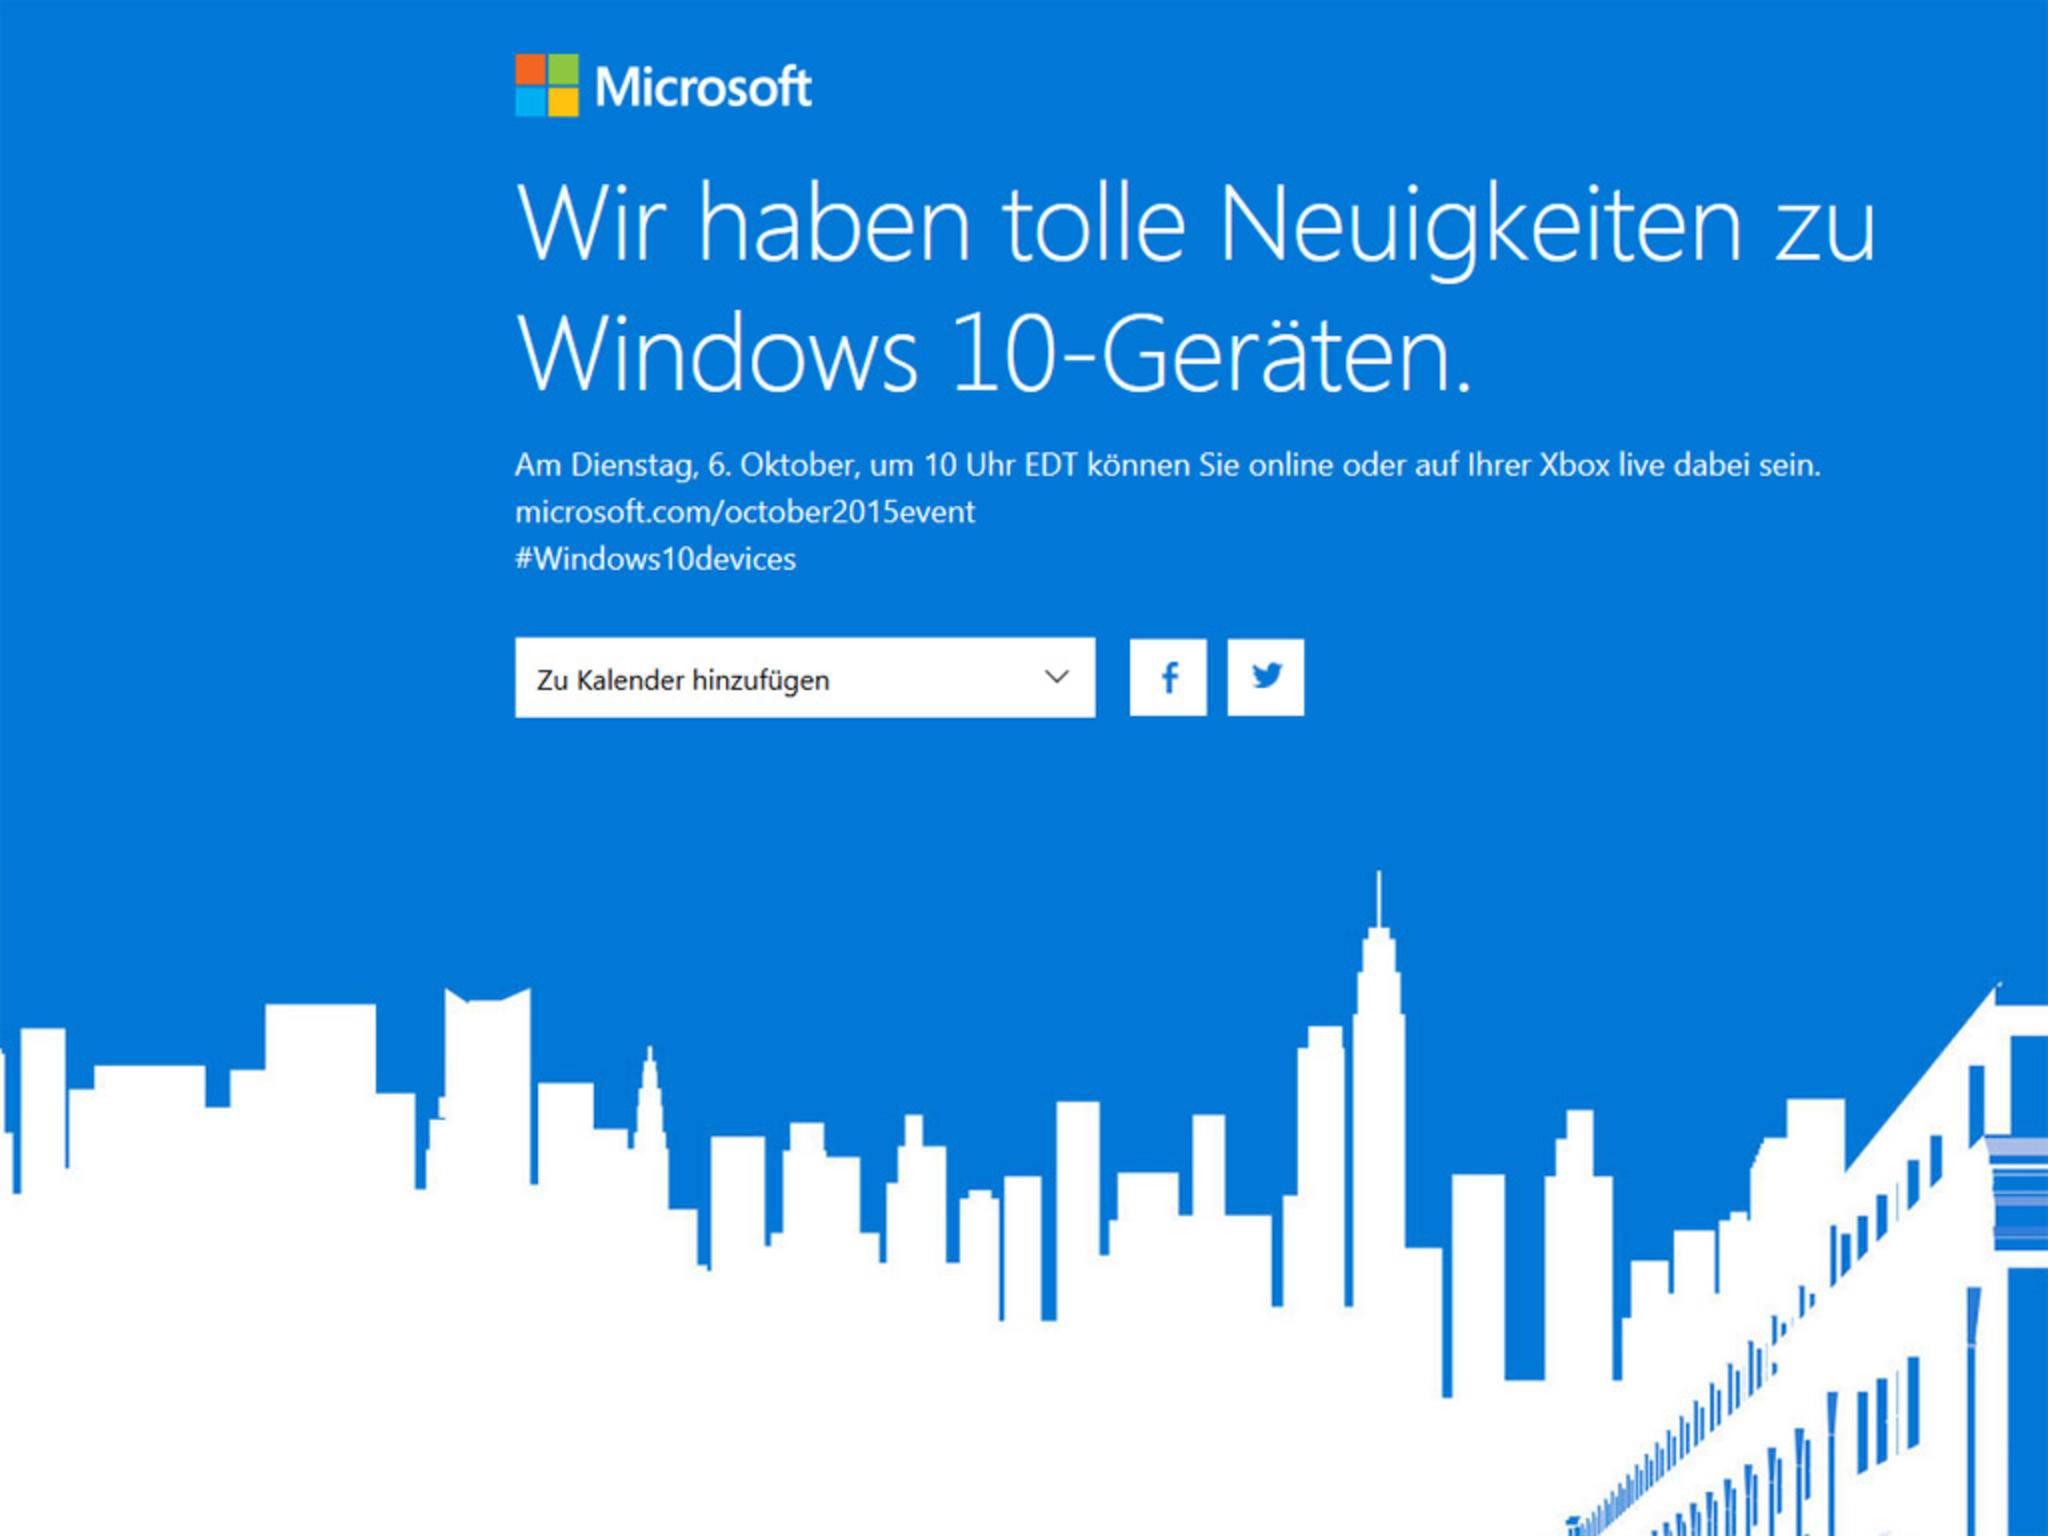 Am 6. Oktober enthüllt Microsoft das Lumia 950 und das Lumia 950 XL.